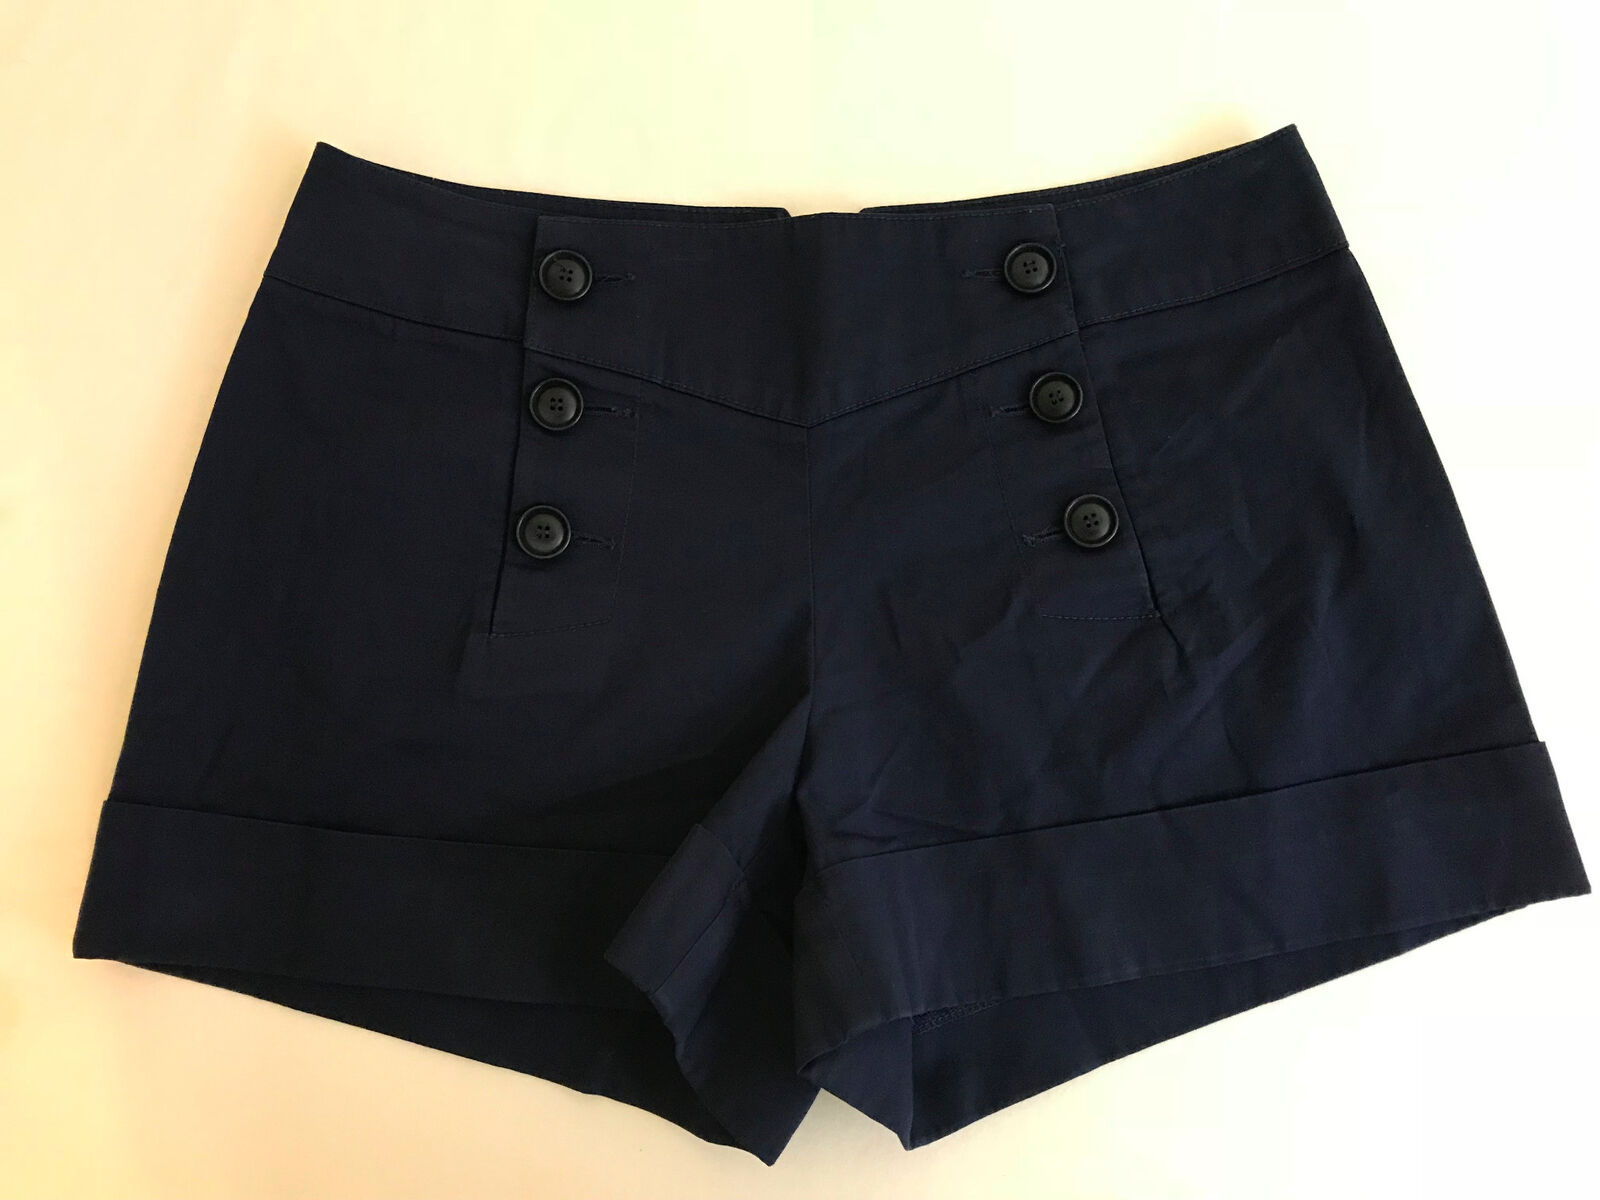 TRINA TURK navy bluee cotton spandex shorts Women's 2